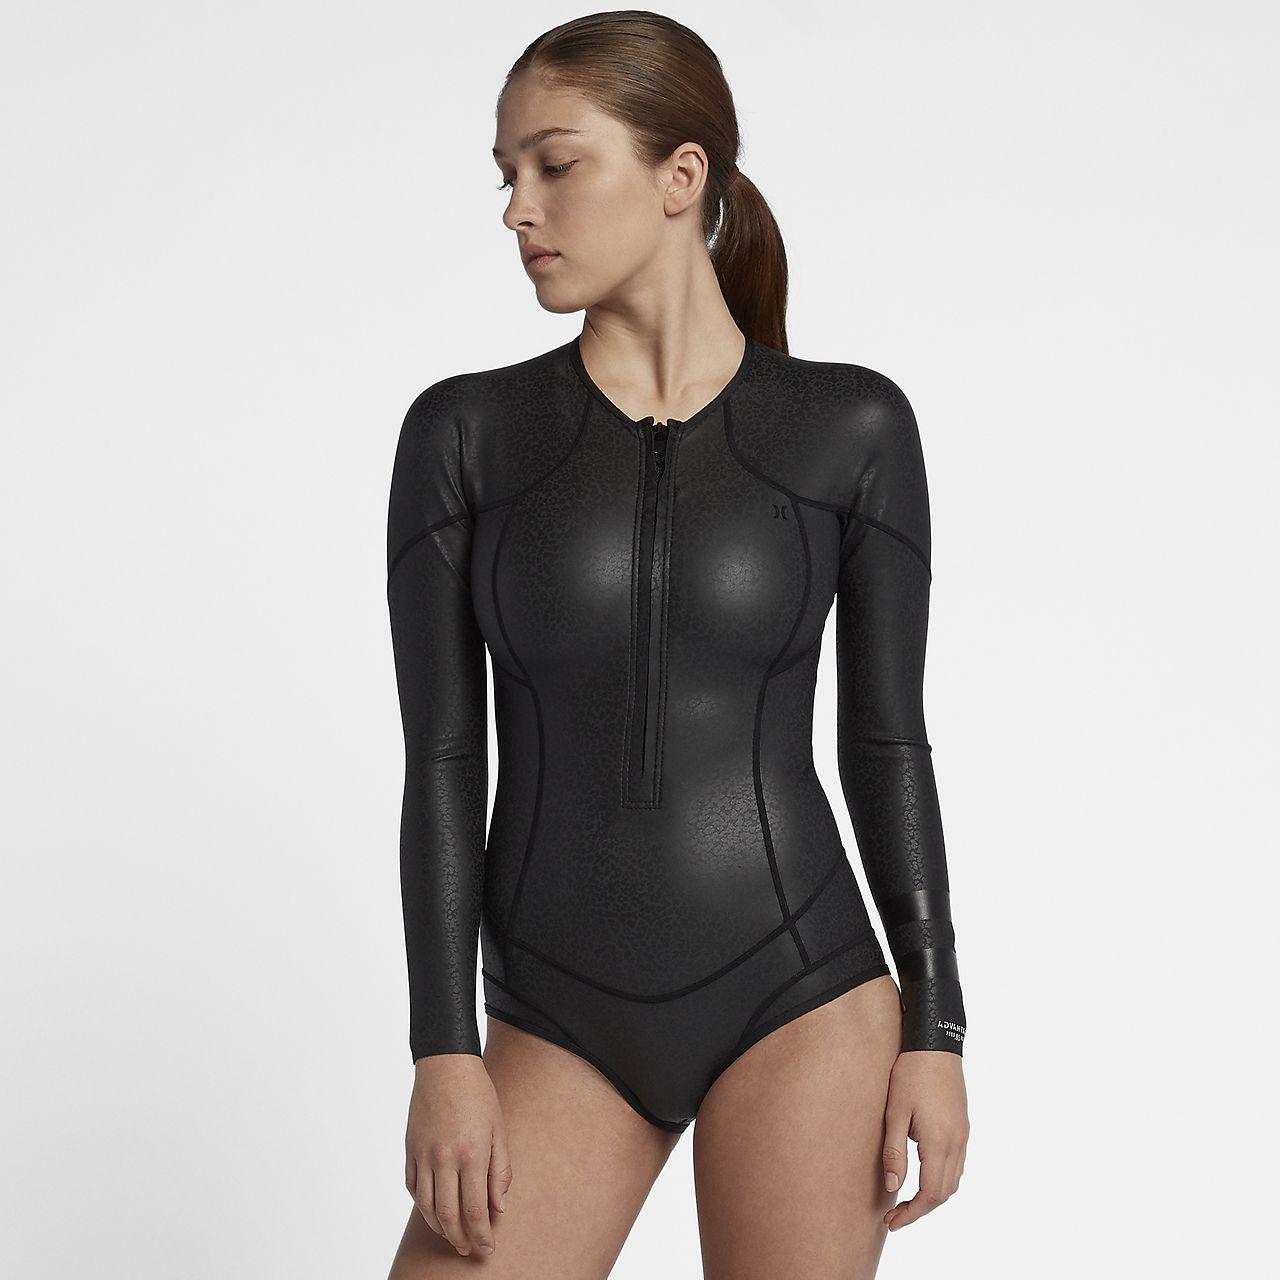 Hurley Advantage Plus 0,5 mm Windskin Springsuit Damen-Neoprenanzug